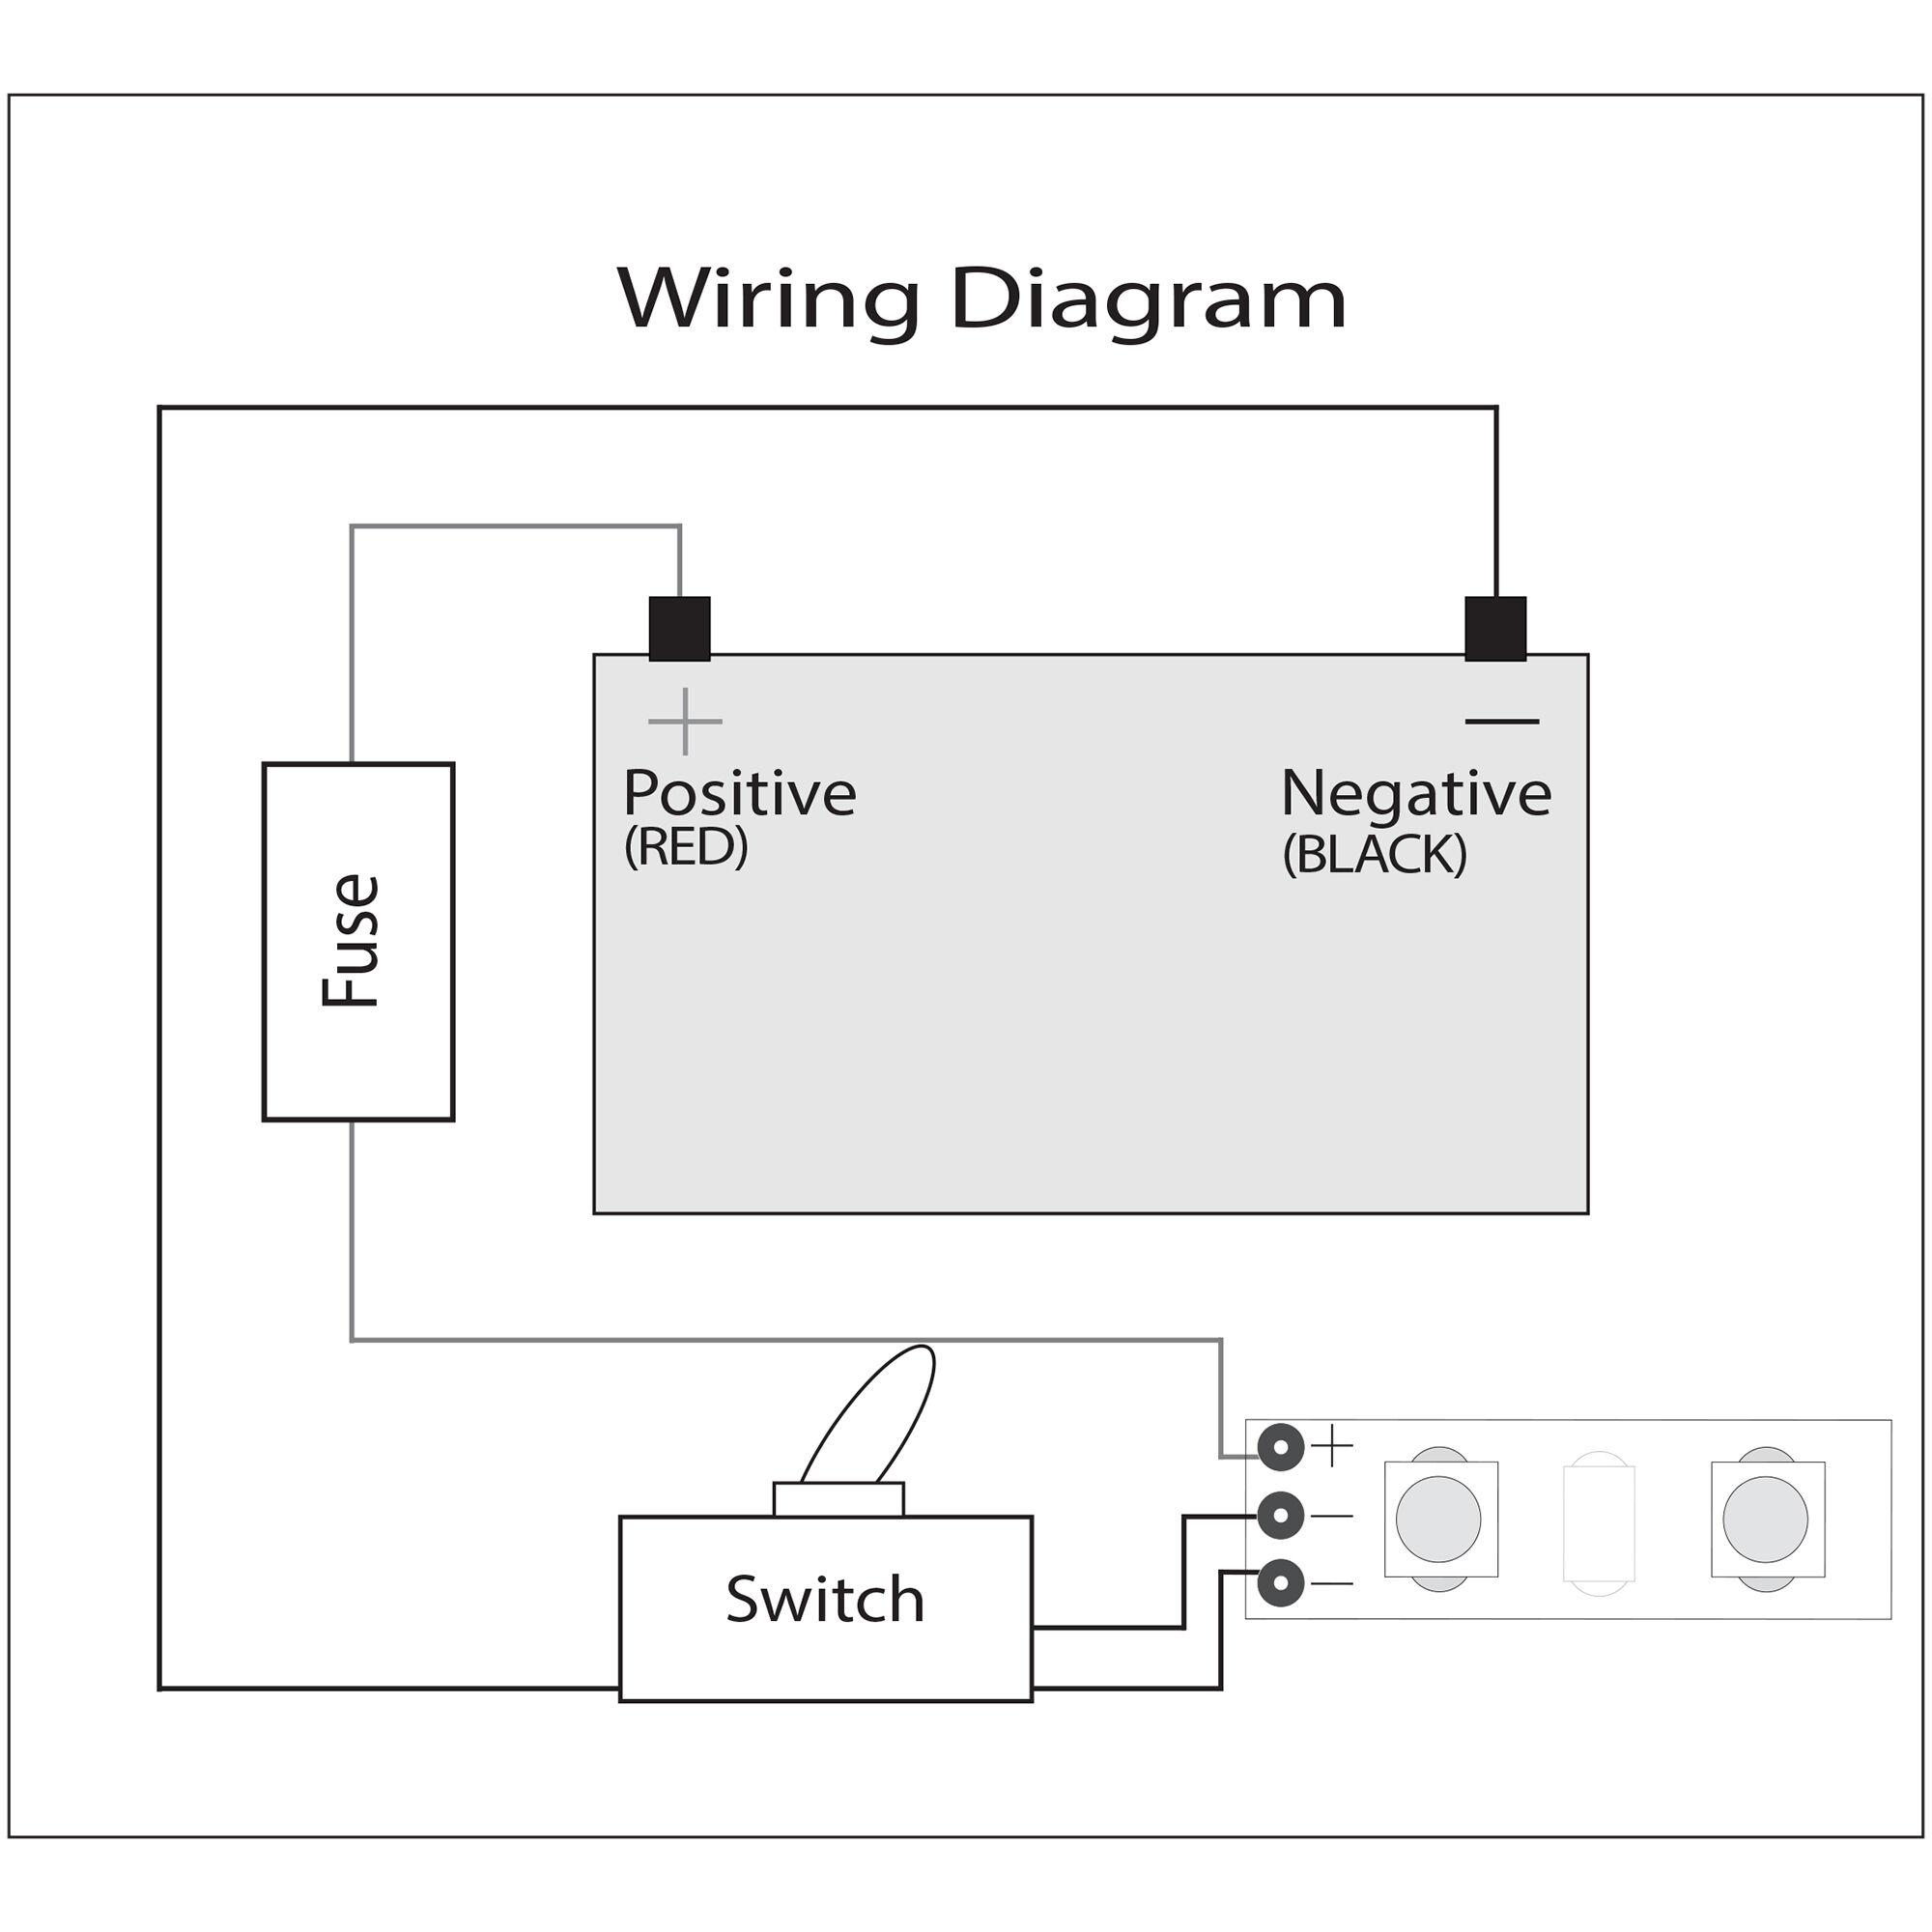 24 Volt Trolling Motor Wiring Led Christmas Light Circuit Diagram 24